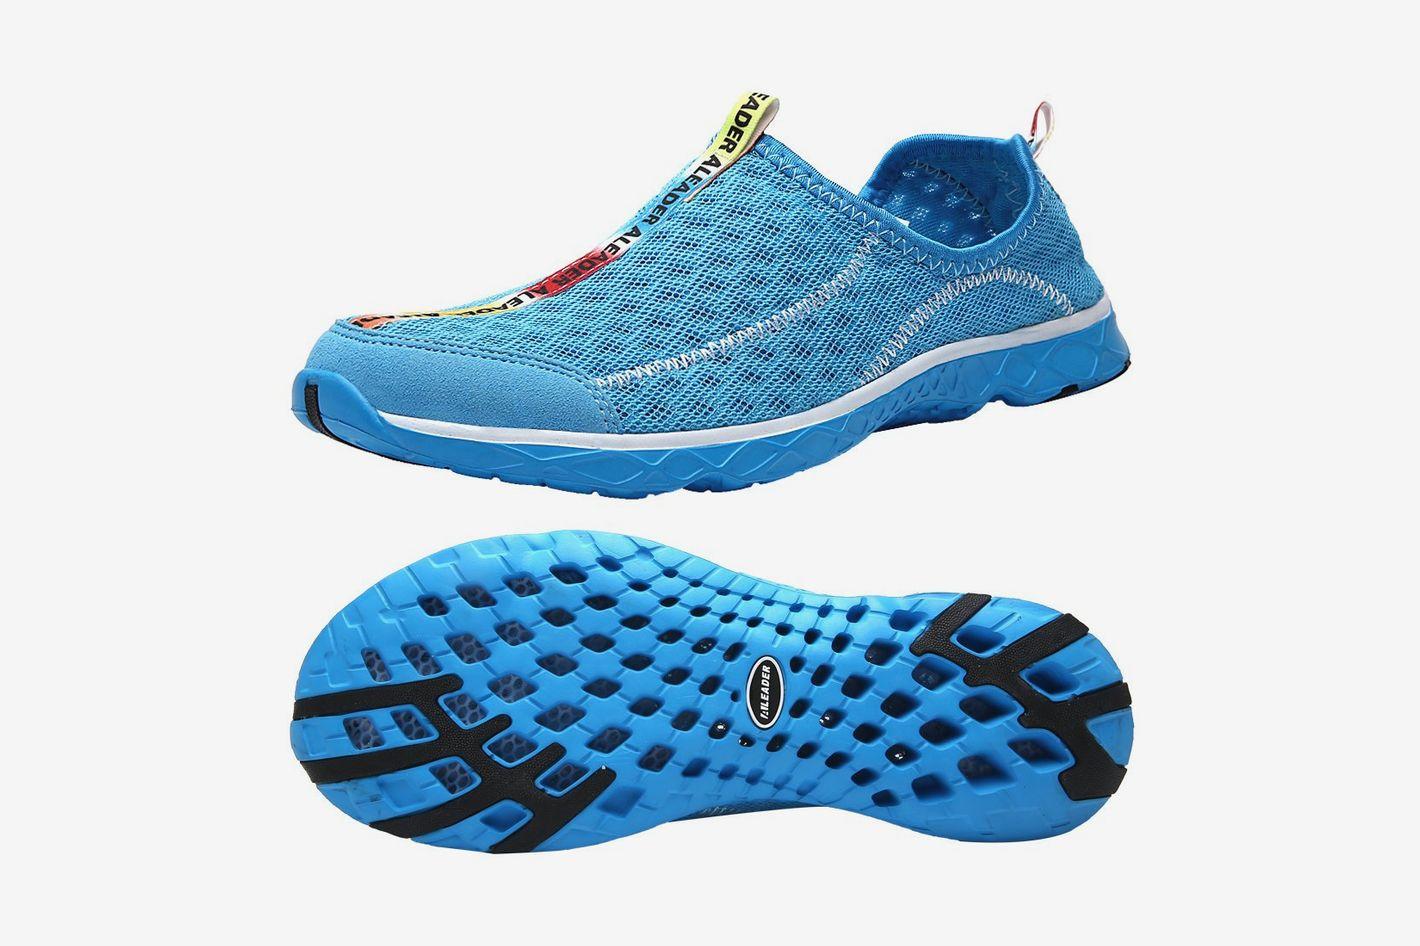 a7399bf69e Aleader Men's Mesh Slip On Water Shoes